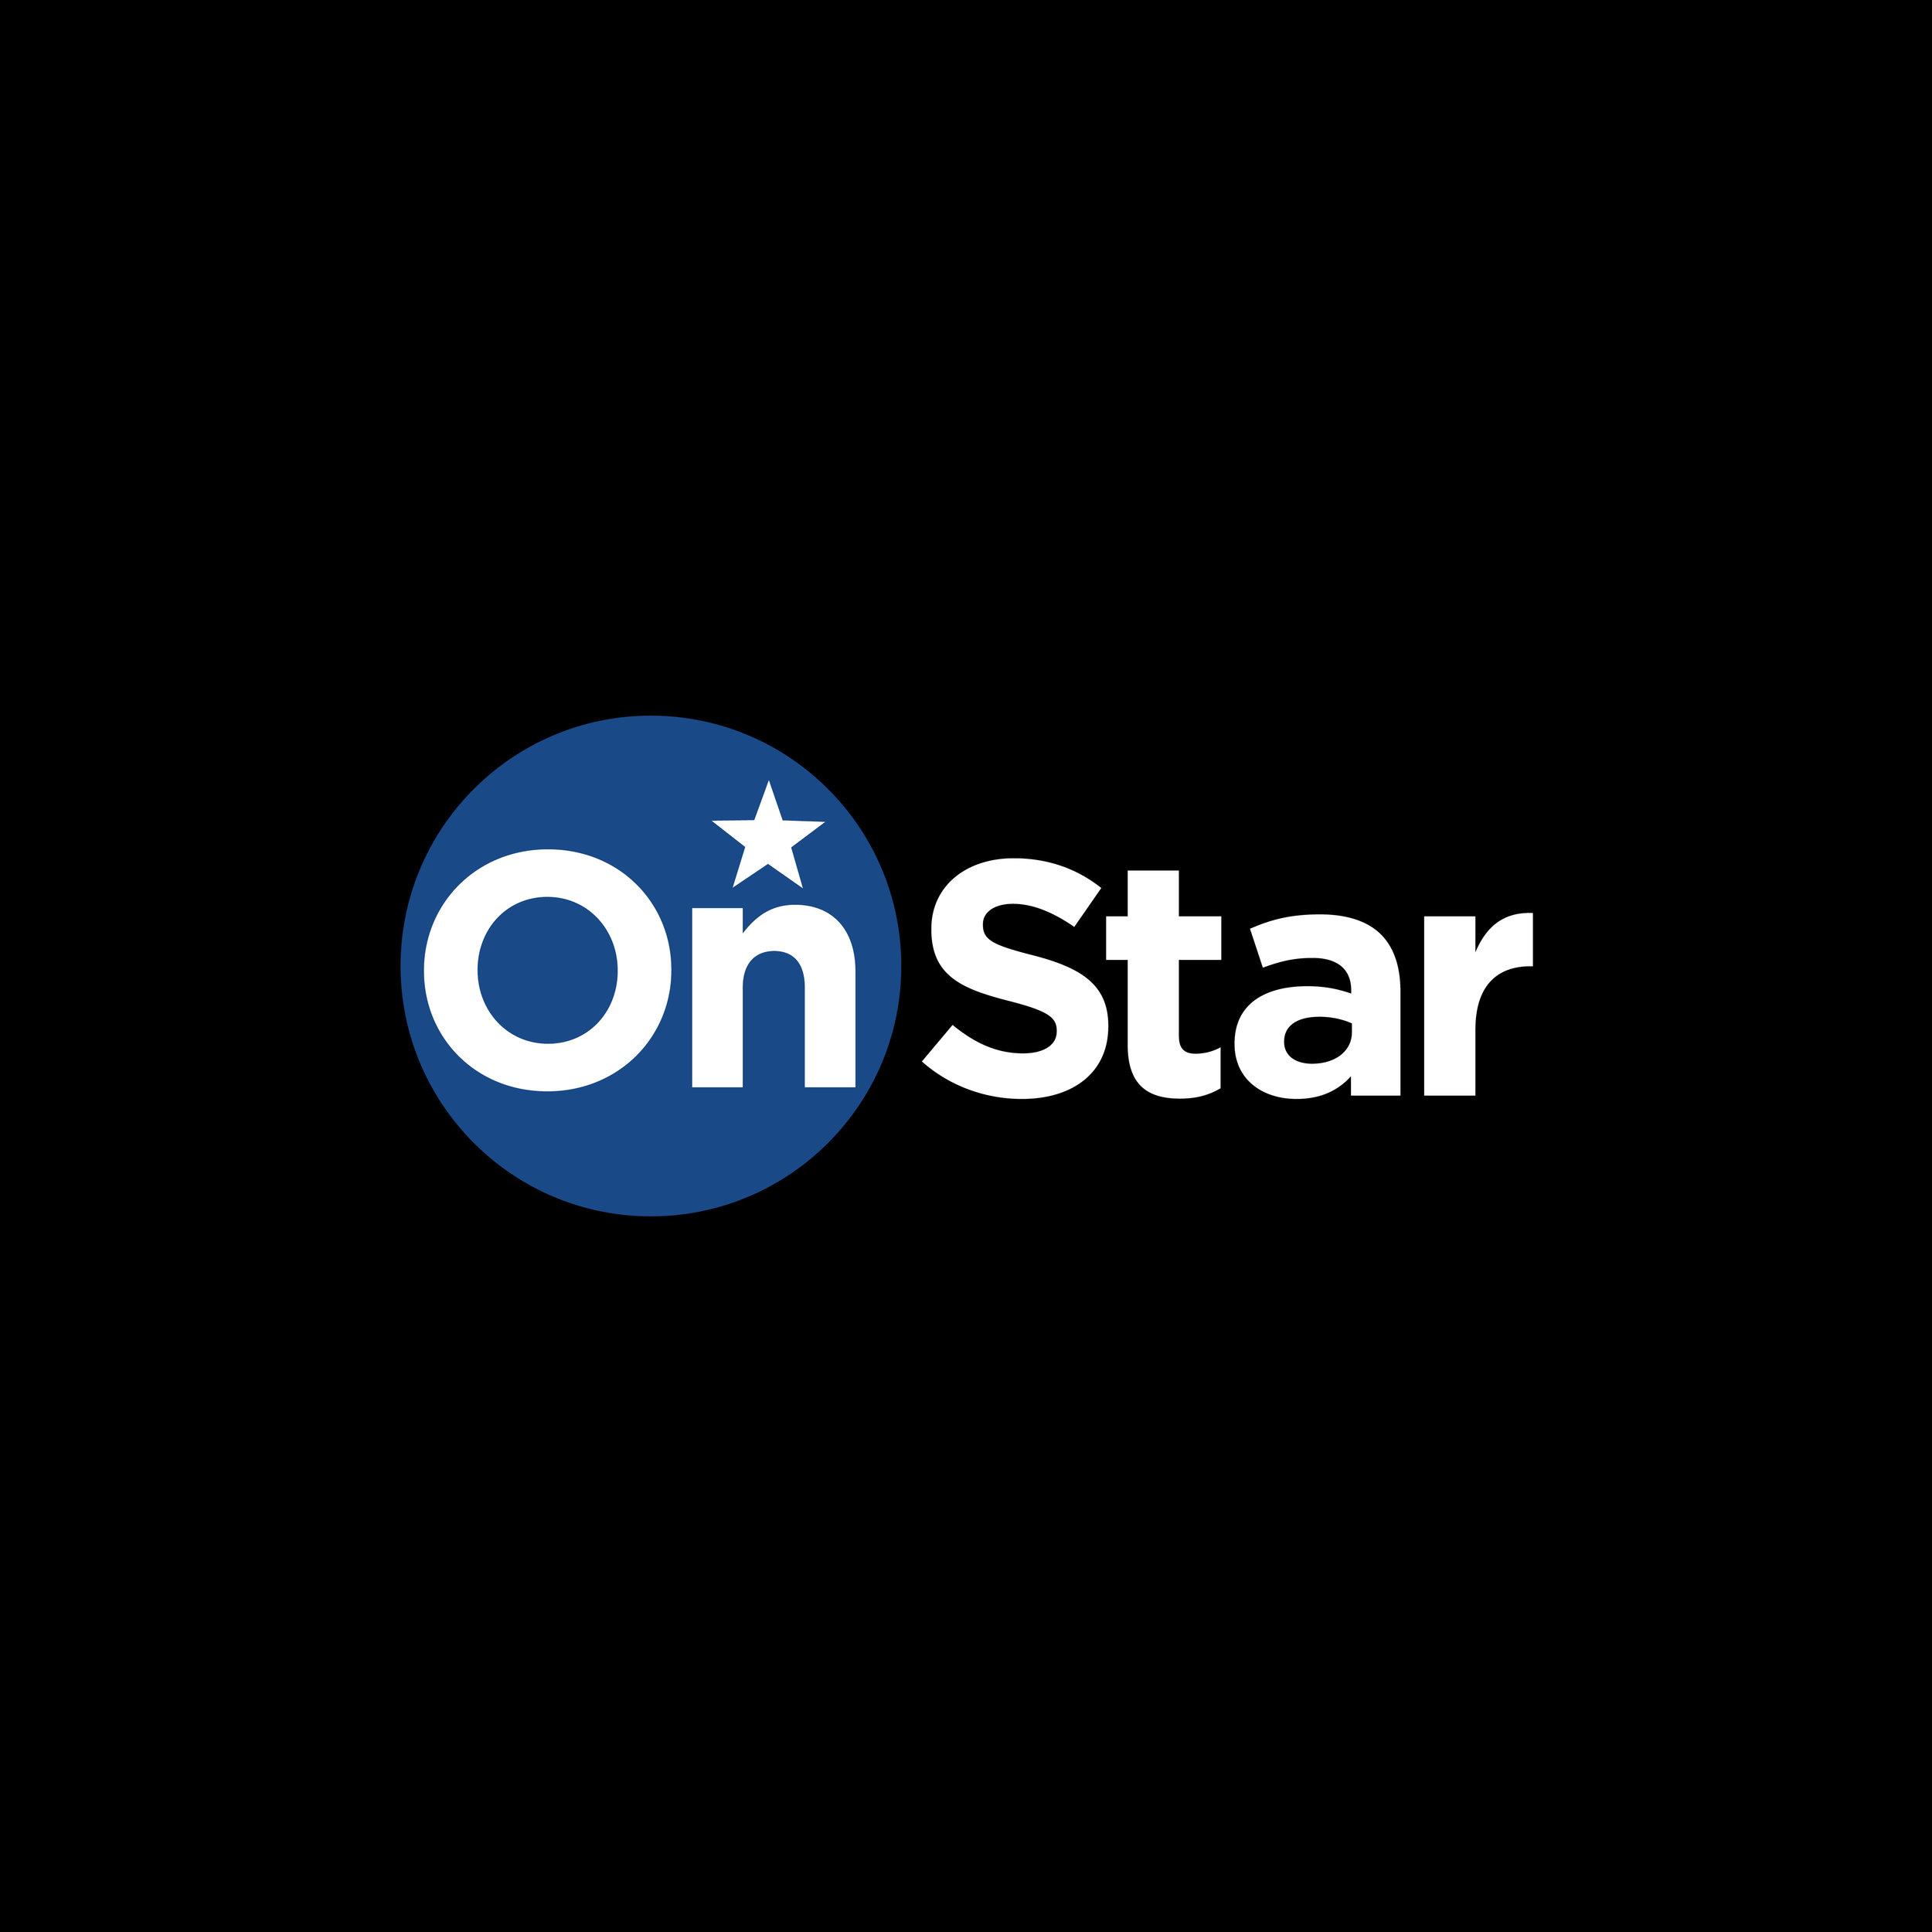 OnStar (General Motors)